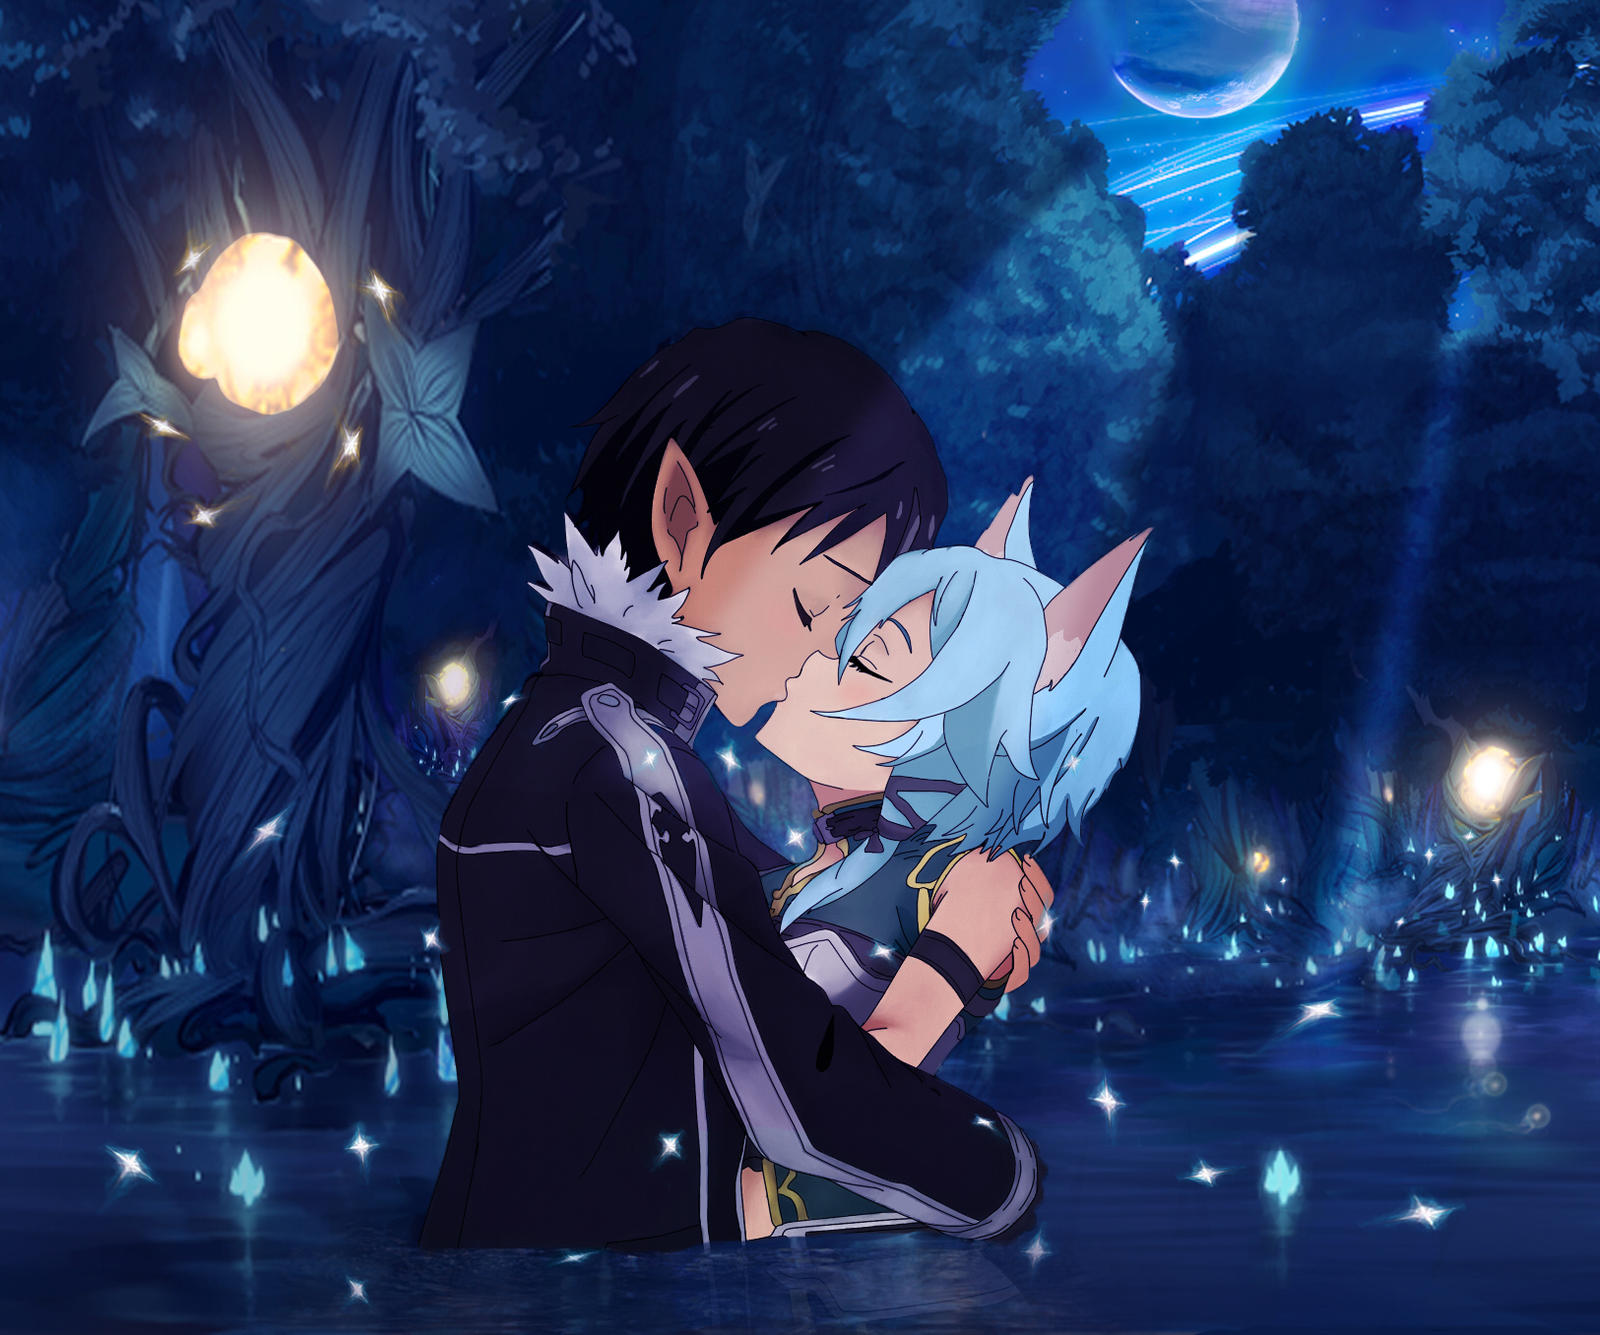 Dress up games favourites by asuna and kirito on deviantart - Kurodoppelganger 83 7 Kirito And Sinon Kiss By Vergilian91